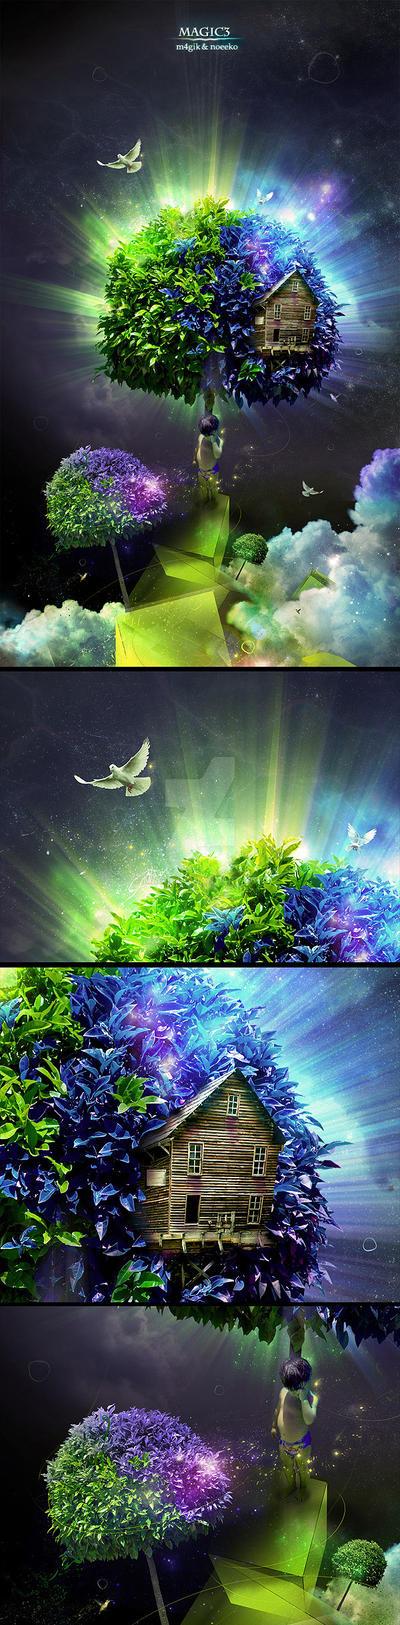 Magic Tree by m4gik